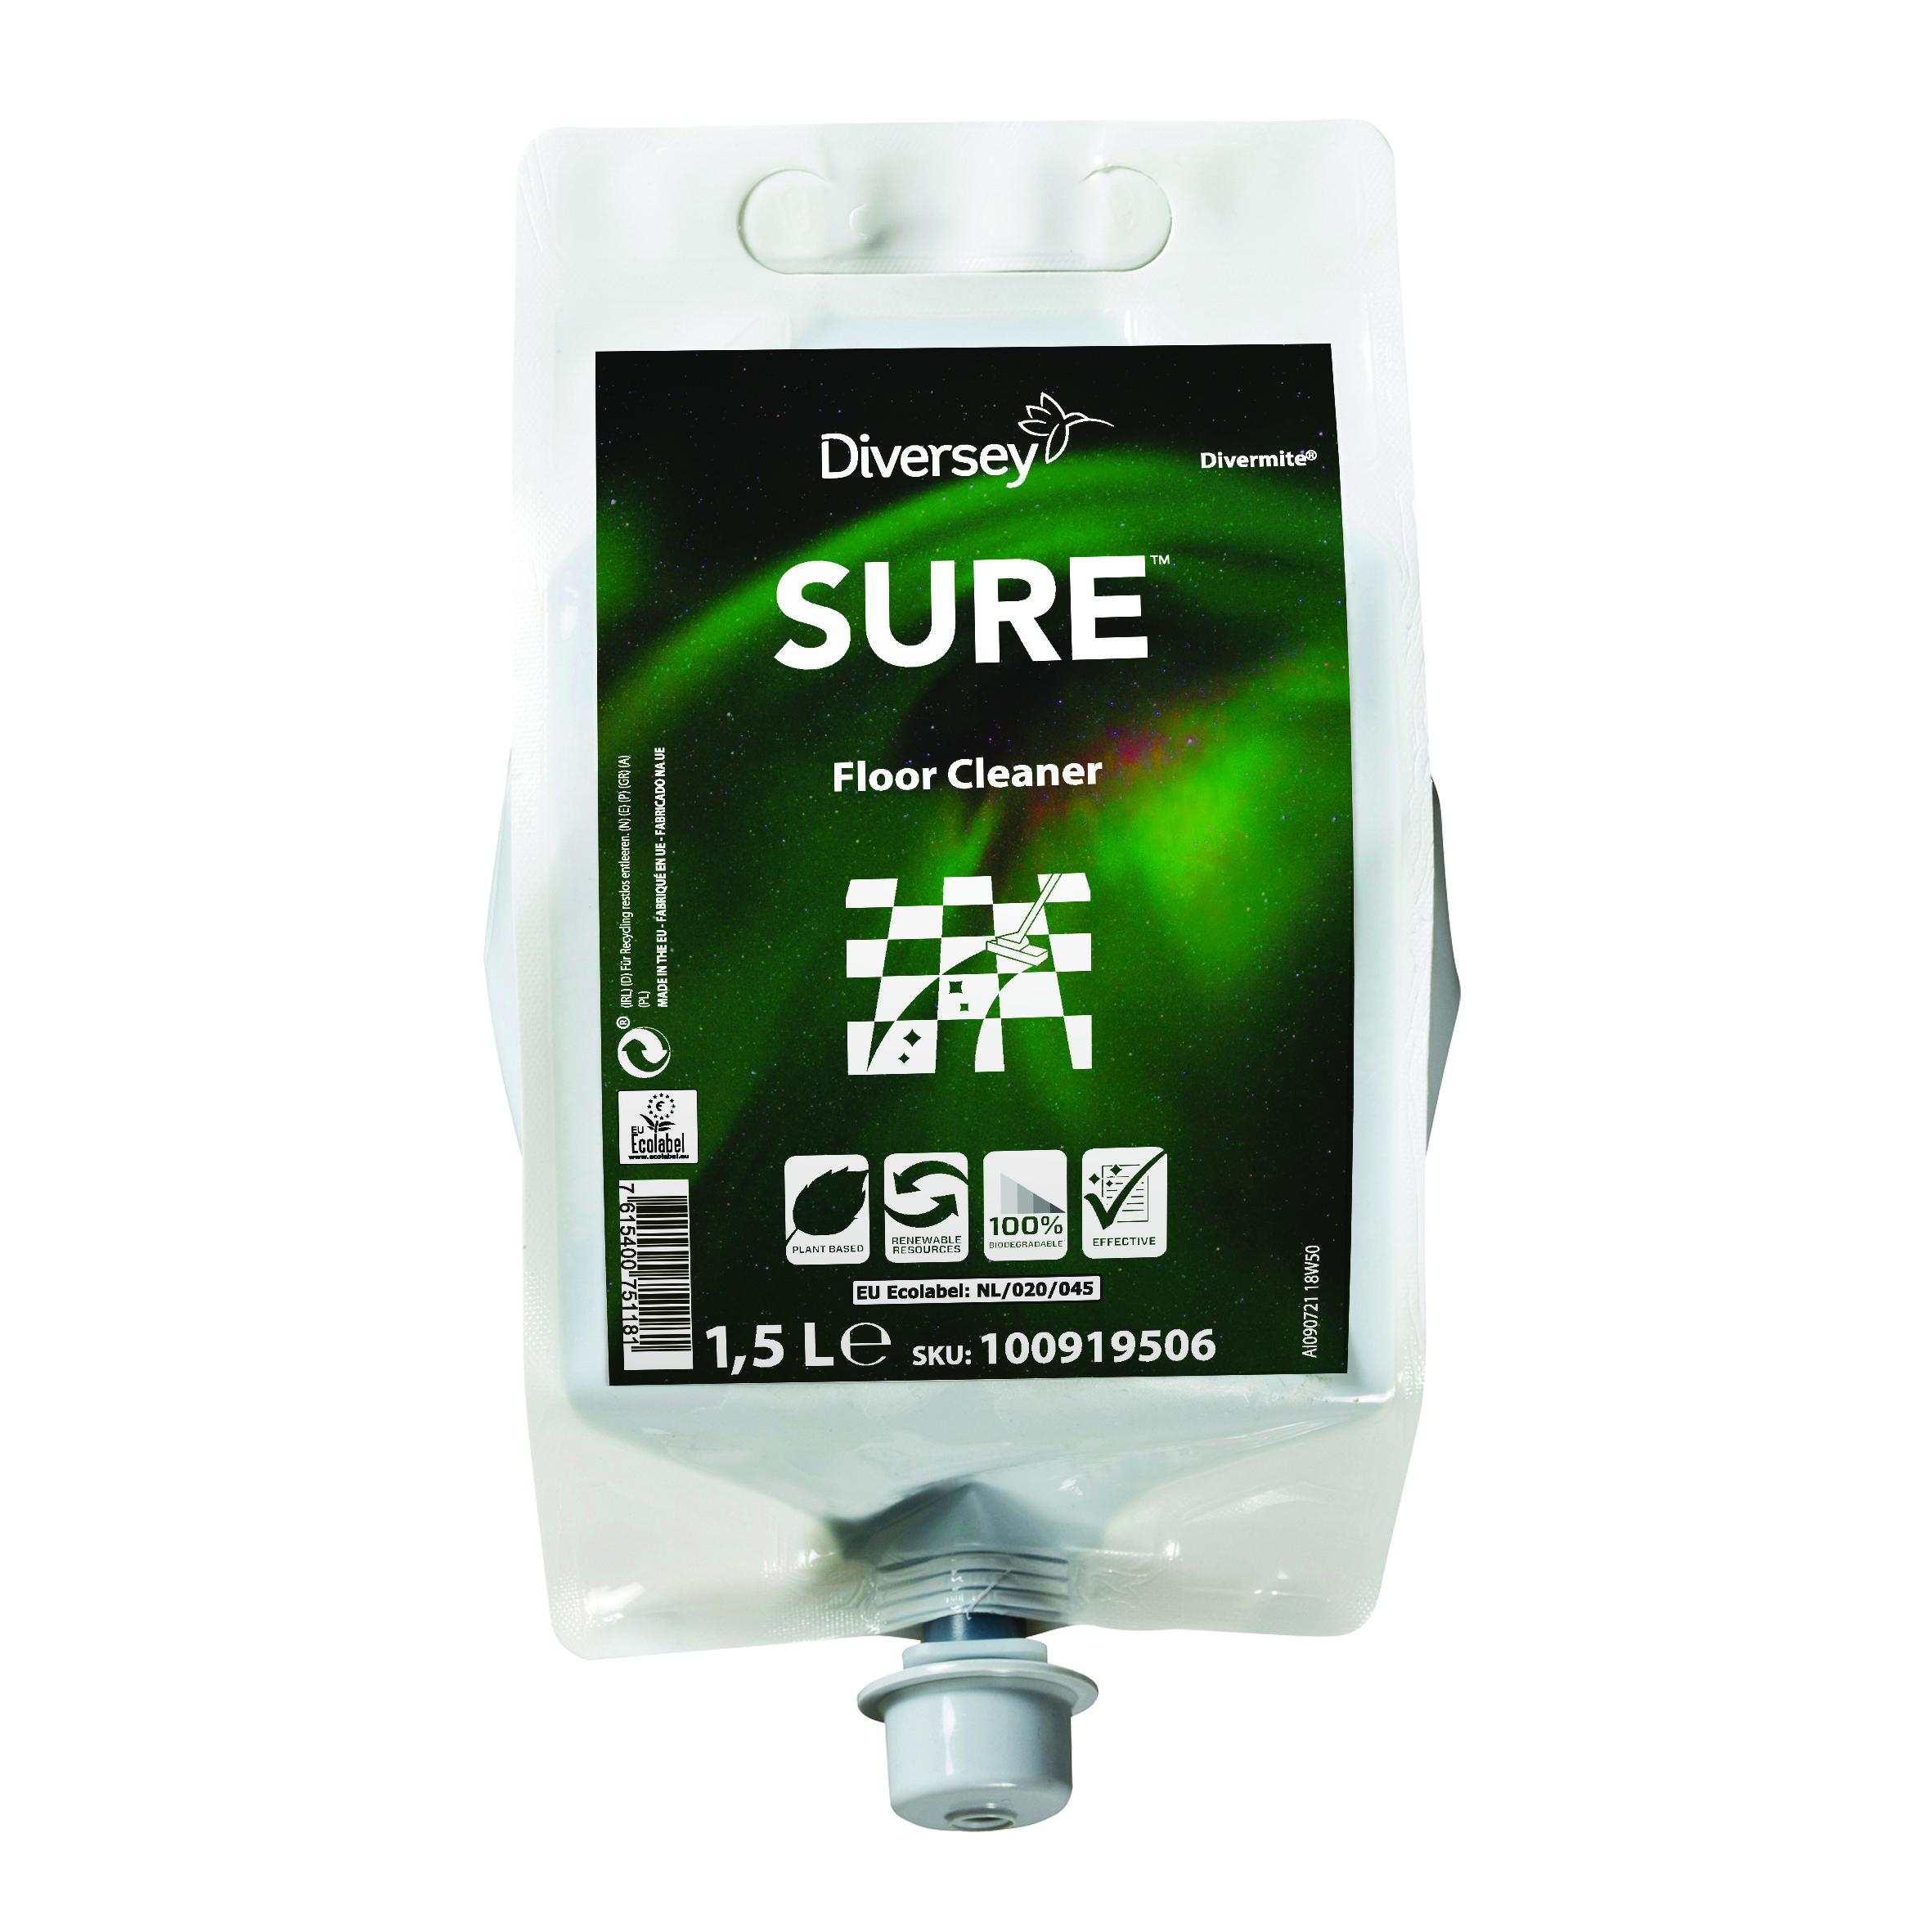 100919506-SURE-Floor-Cleaner-Divermite-Pouch-1.5L-CMKY-20x20cm.jpg